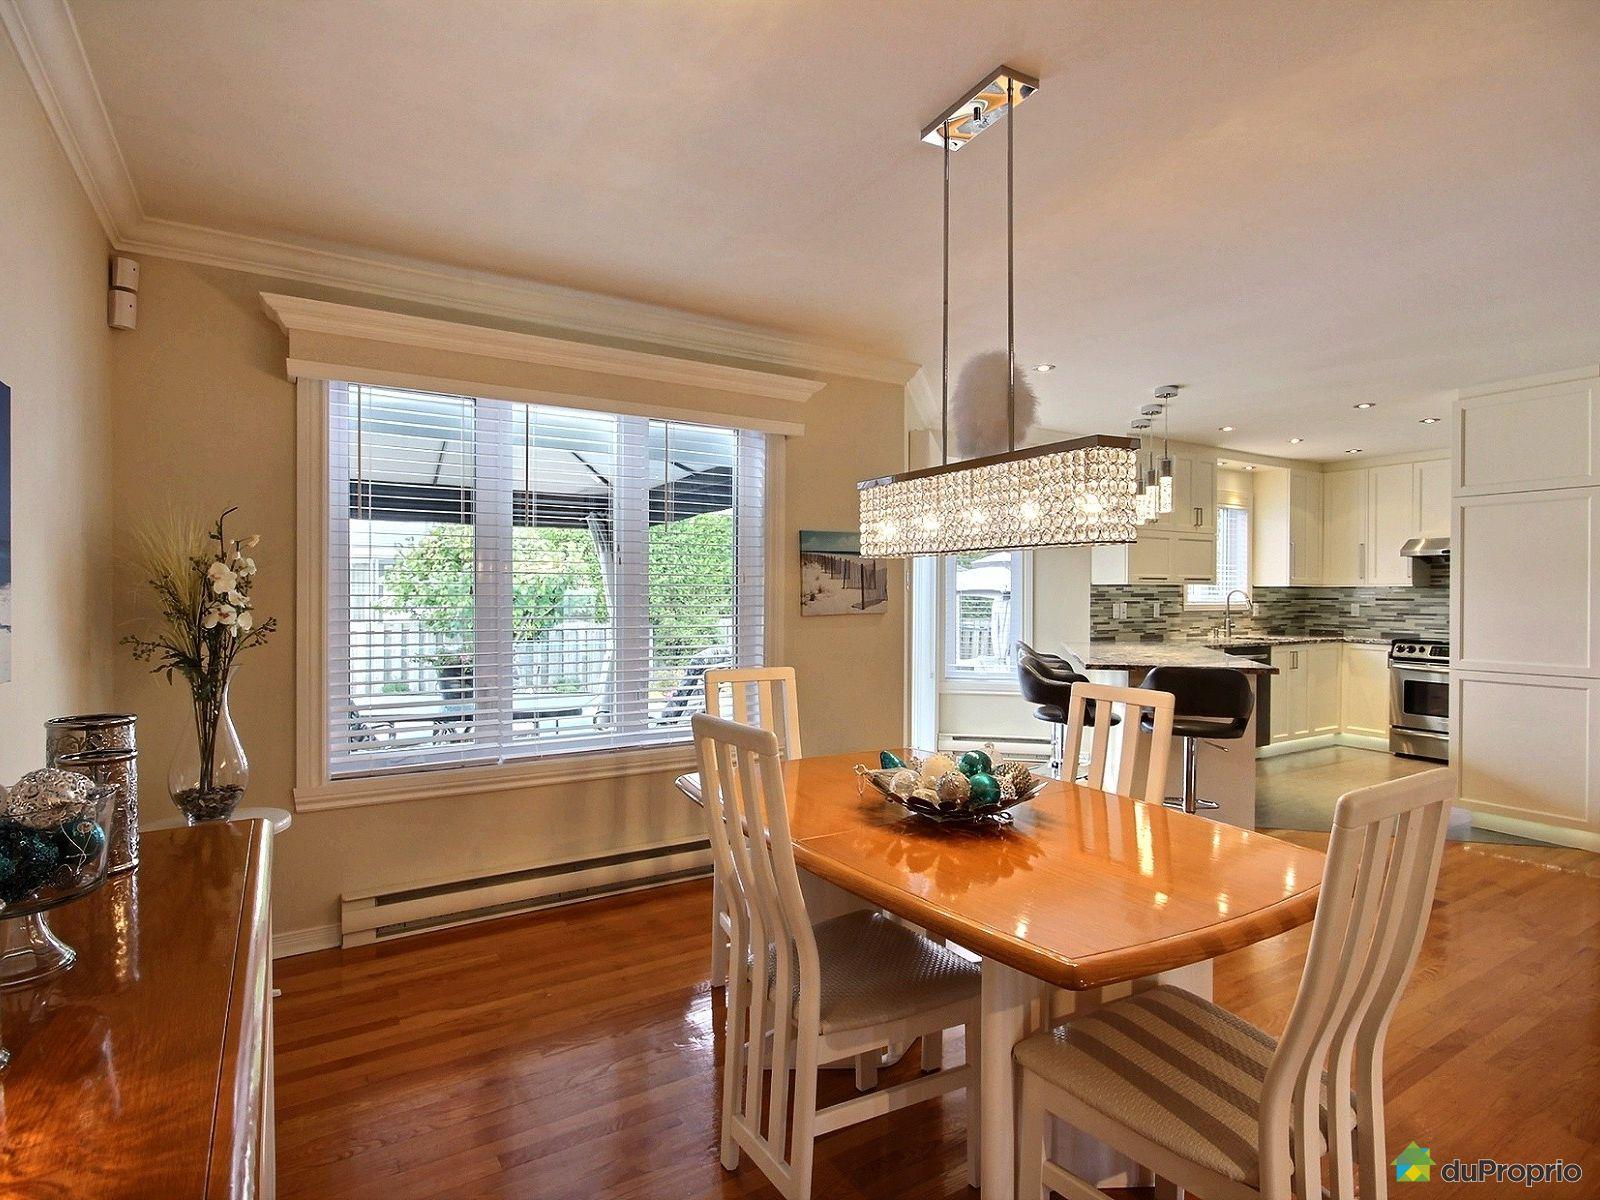 Maison vendre longueuil 3551 rue belcourt immobilier for Salle a manger a vendre